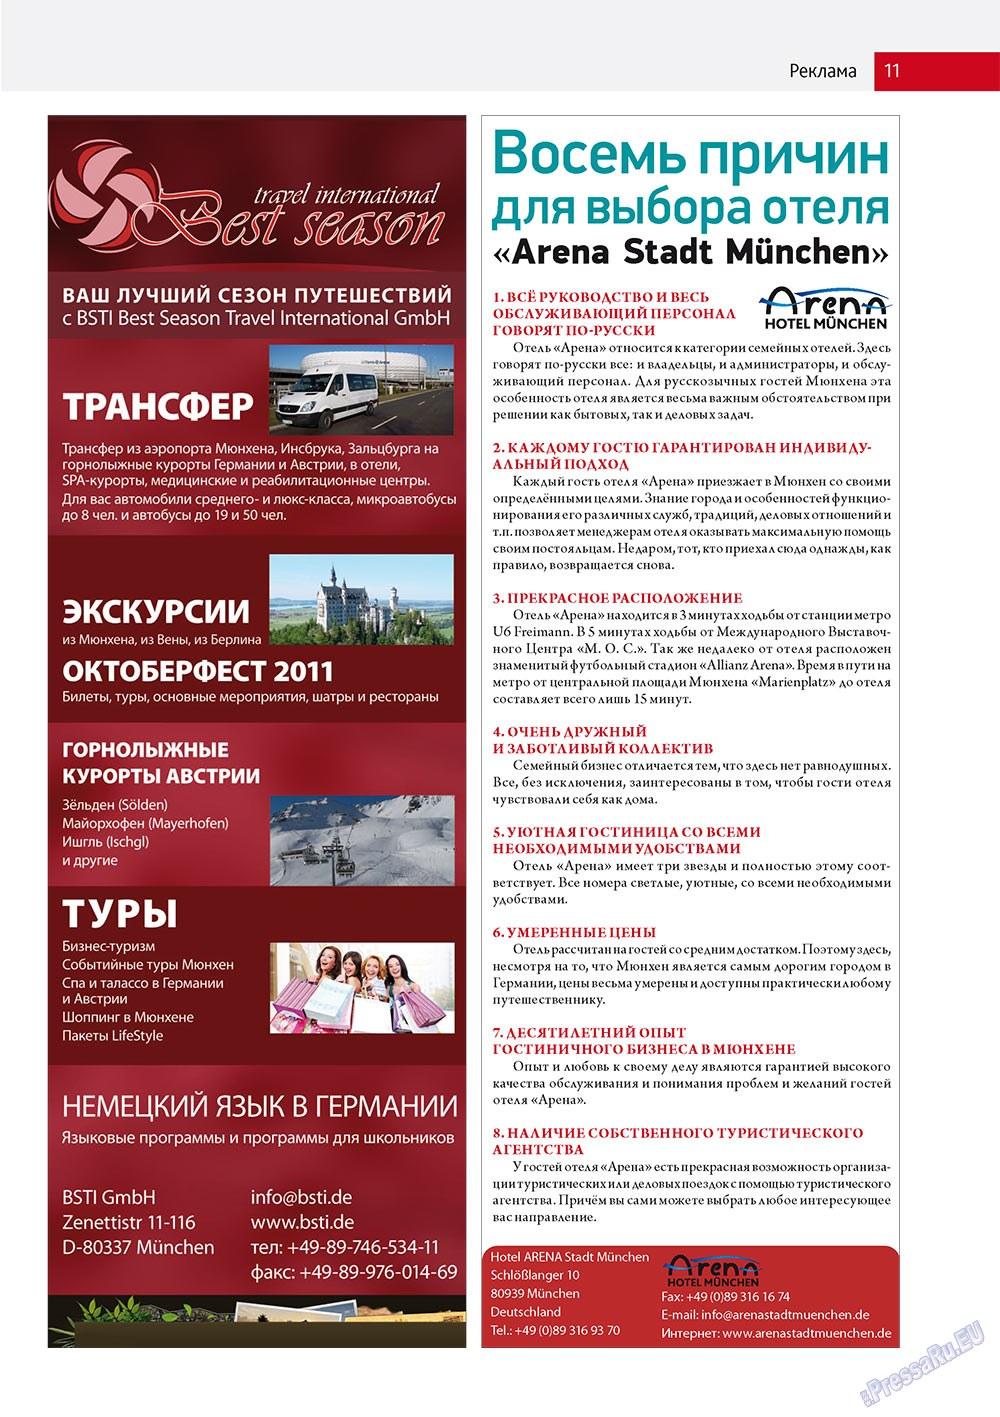 Бизнес парк (журнал). 2011 год, номер 4, стр. 11